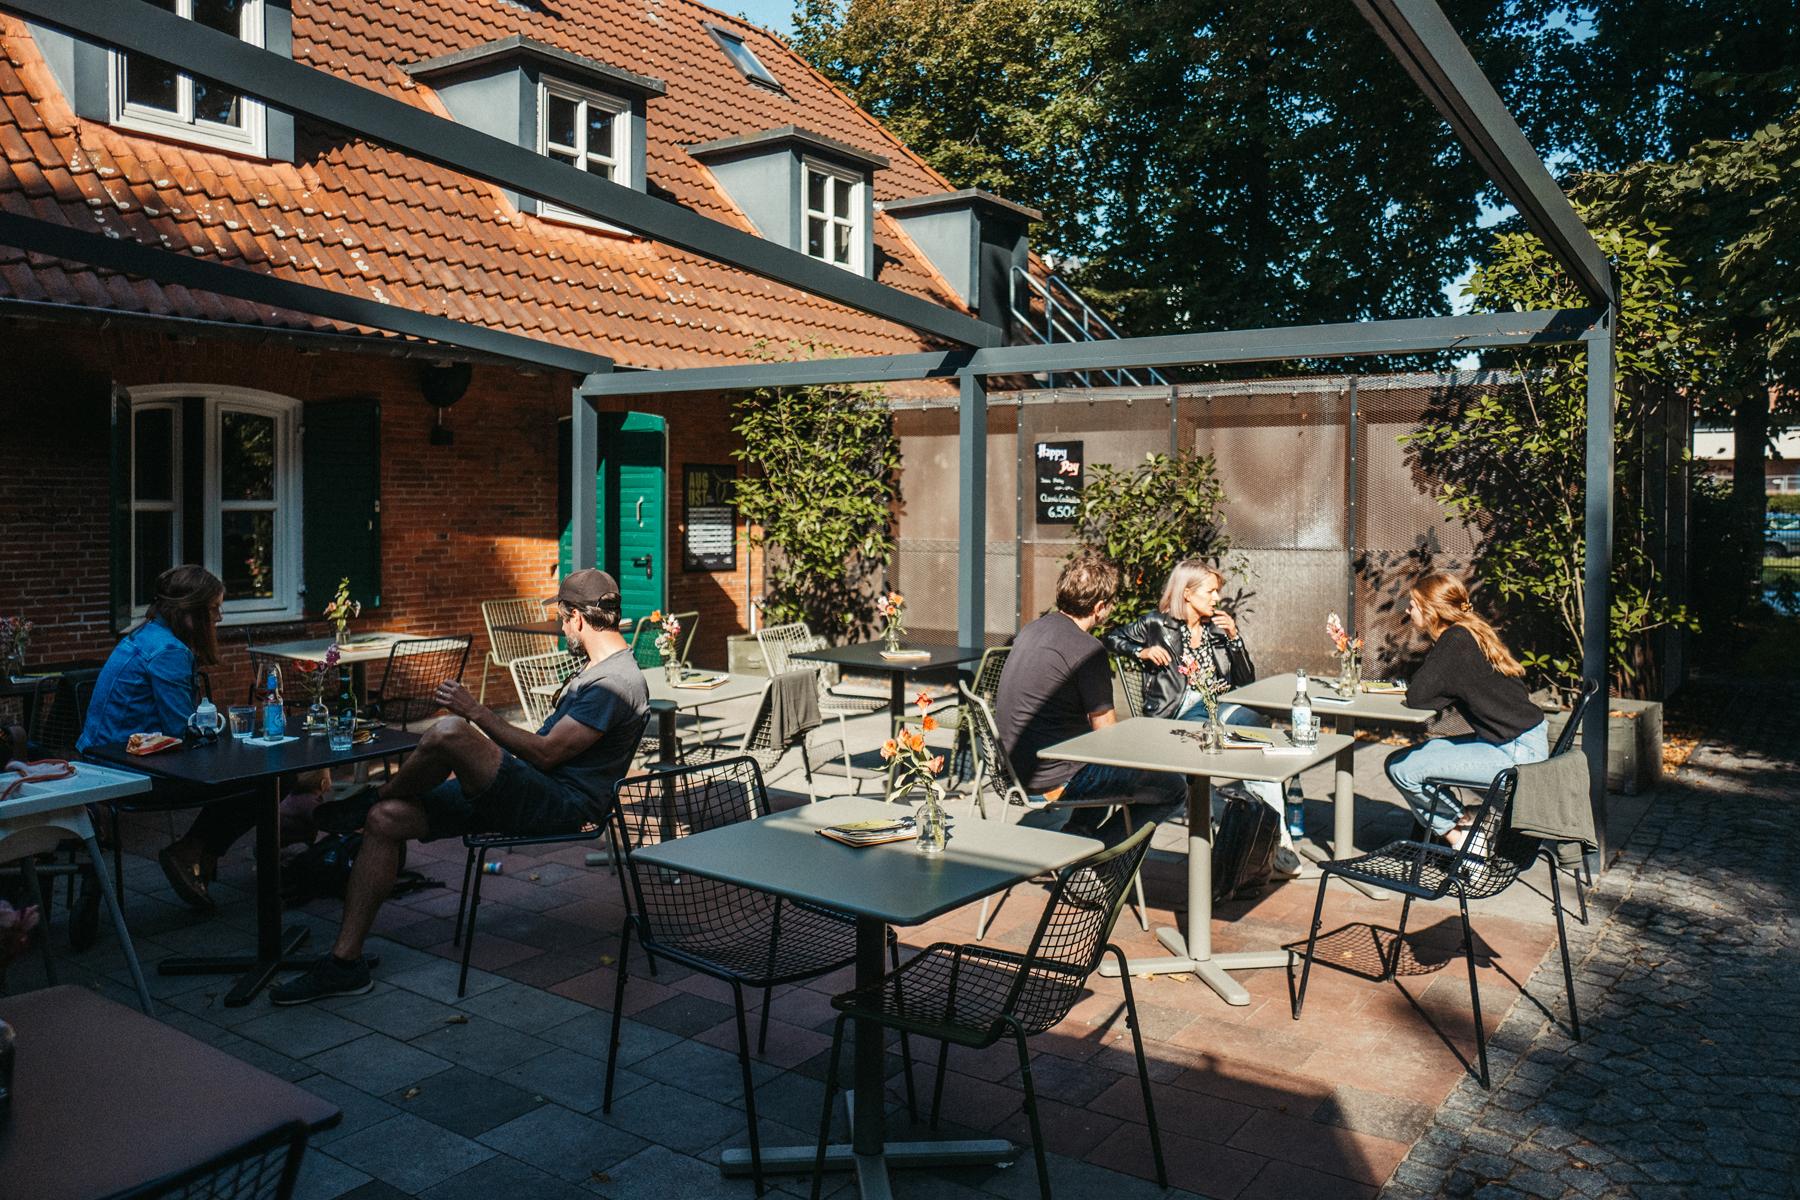 Geheimtipp Hamburg St Pauli Café Grüner Jäger Dahlina Sophie Kock 007